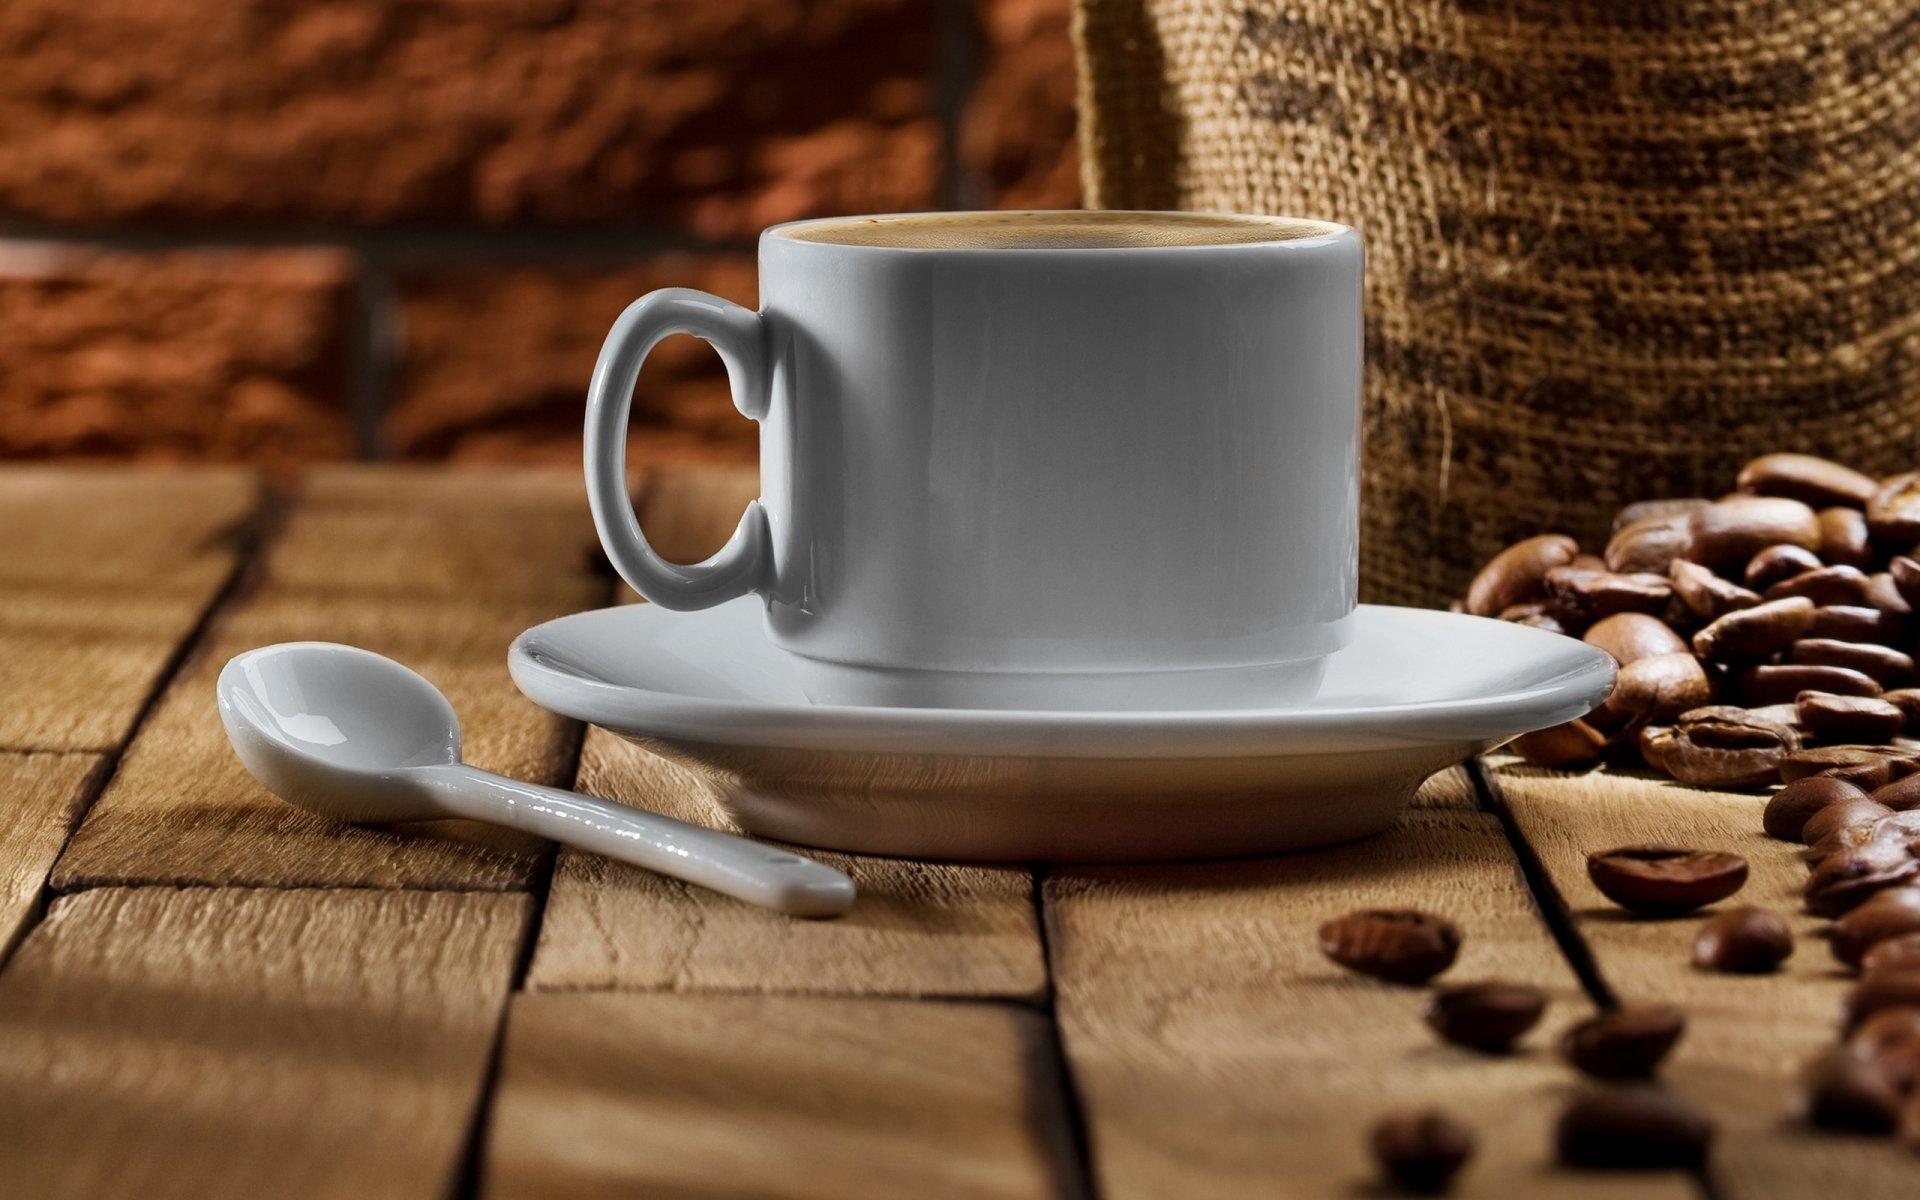 Картинки чашки с кофе на столе